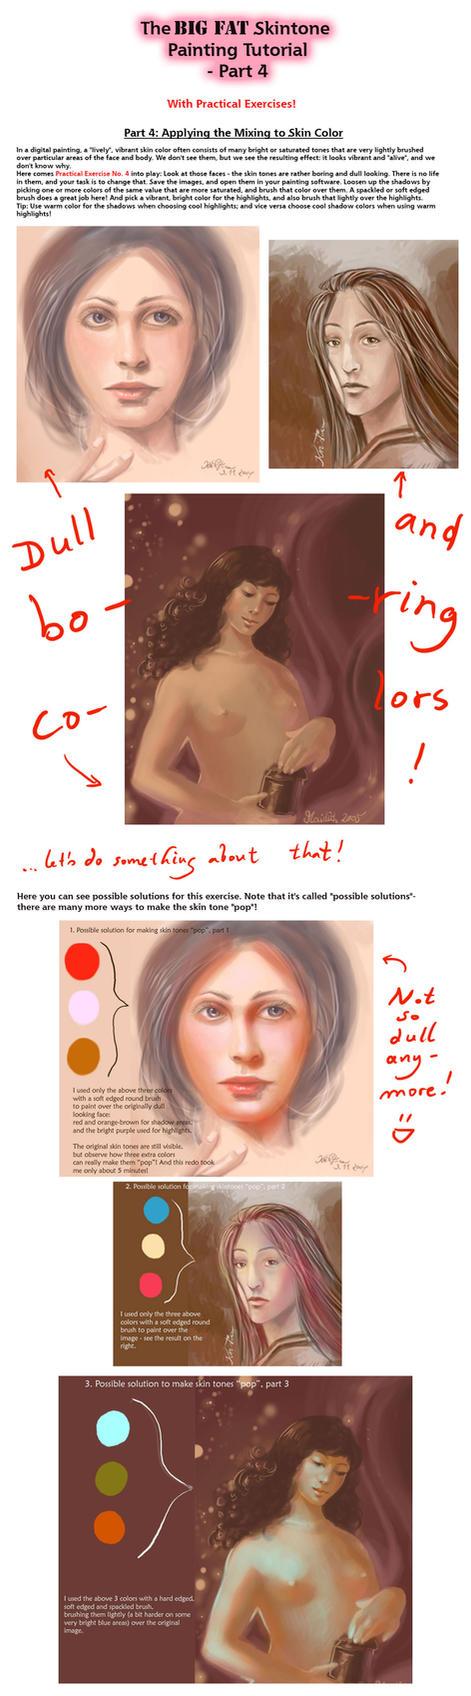 Skintone Tutorial part 4 by KristinaGehrmann